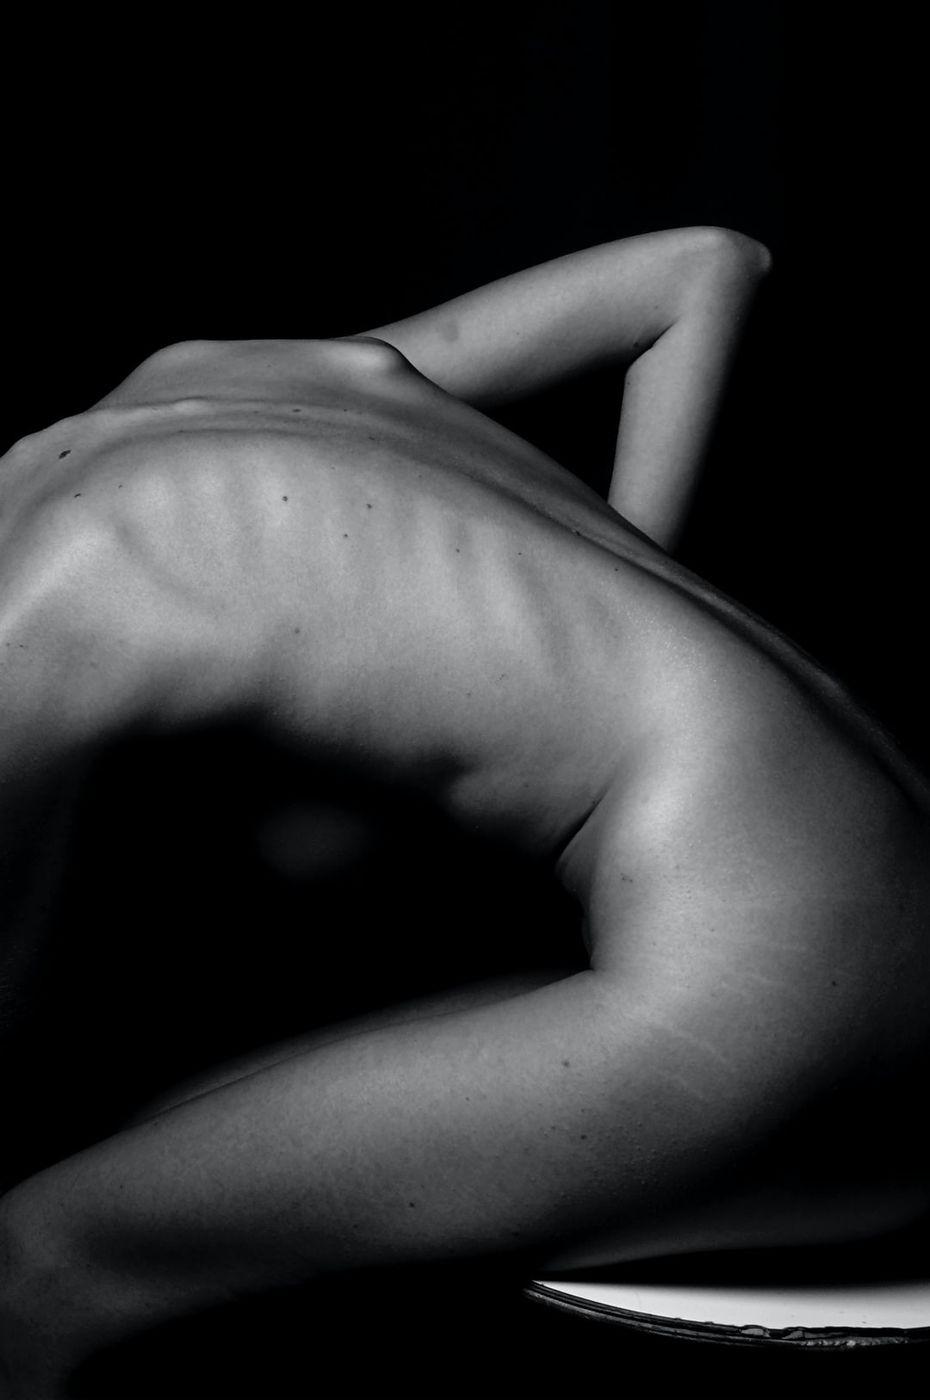 "Photo by <a href=""https://unsplash.com/@emilianovittoriosi?utm_source=magma&utm_medium=referral"">Emiliano Vittoriosi</a> on <a href=""https://unsplash.com/?utm_source=magma&utm_medium=referral"">Unsplash</a>"